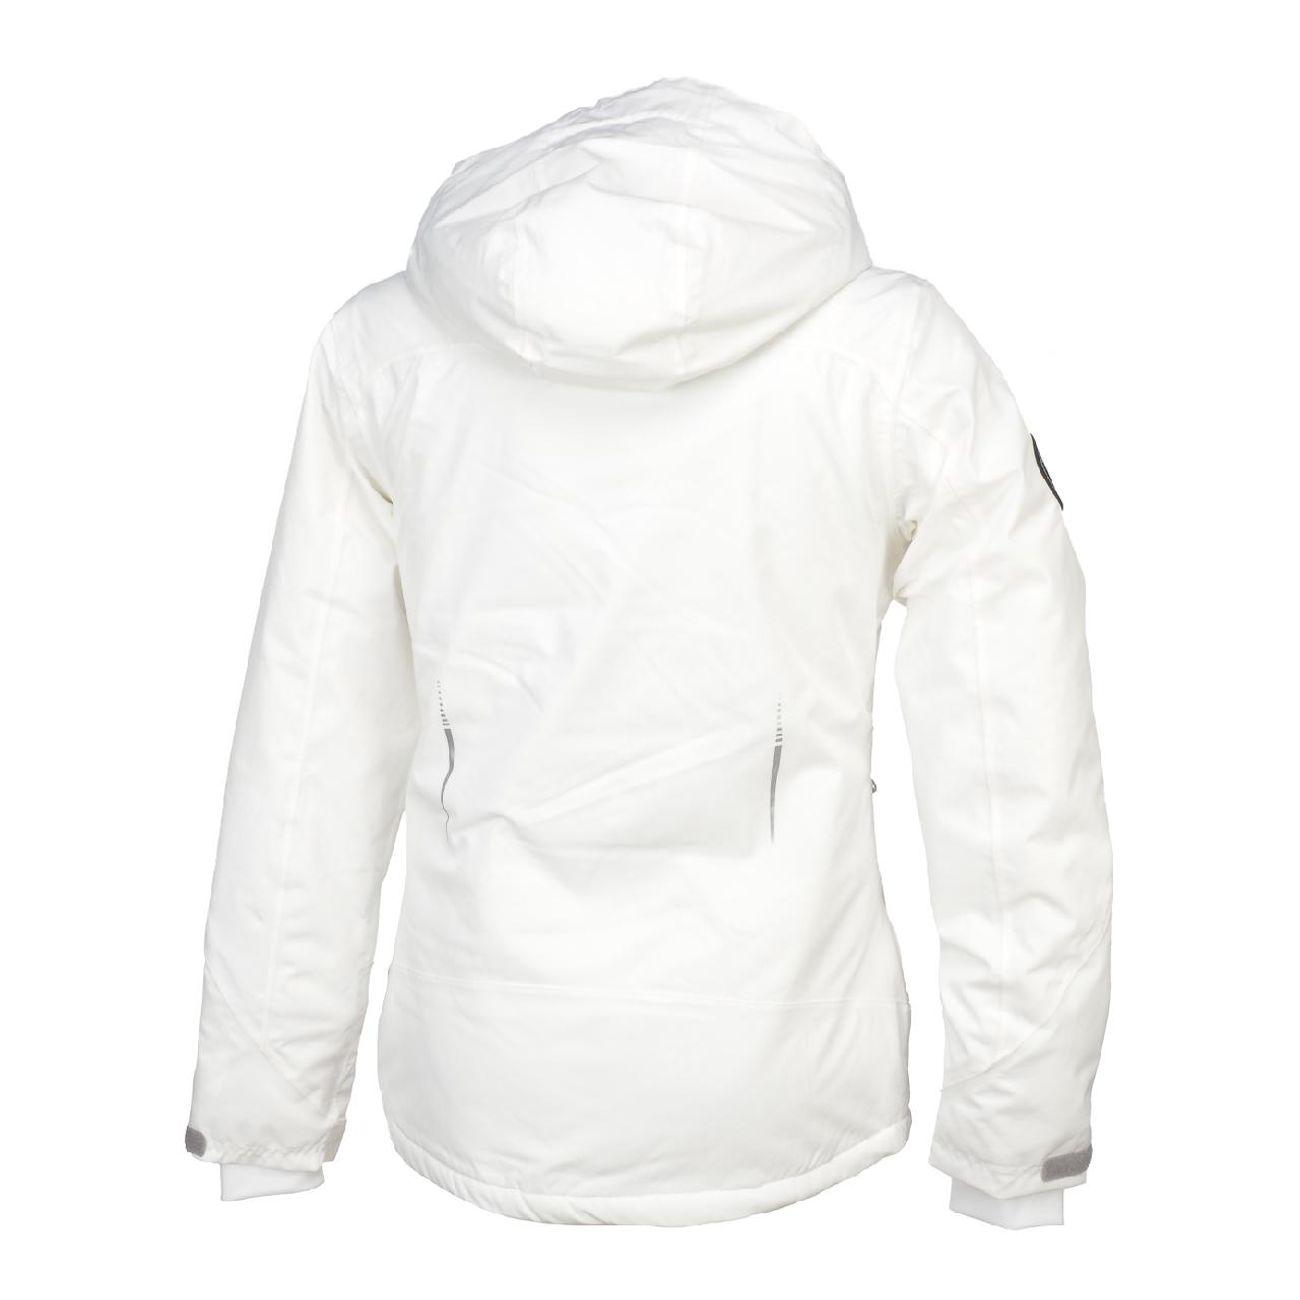 Femme Niwow Jacket Alpes Vertigo Blanc Ski Qpgsulmvz Lady myN0Ovnw8